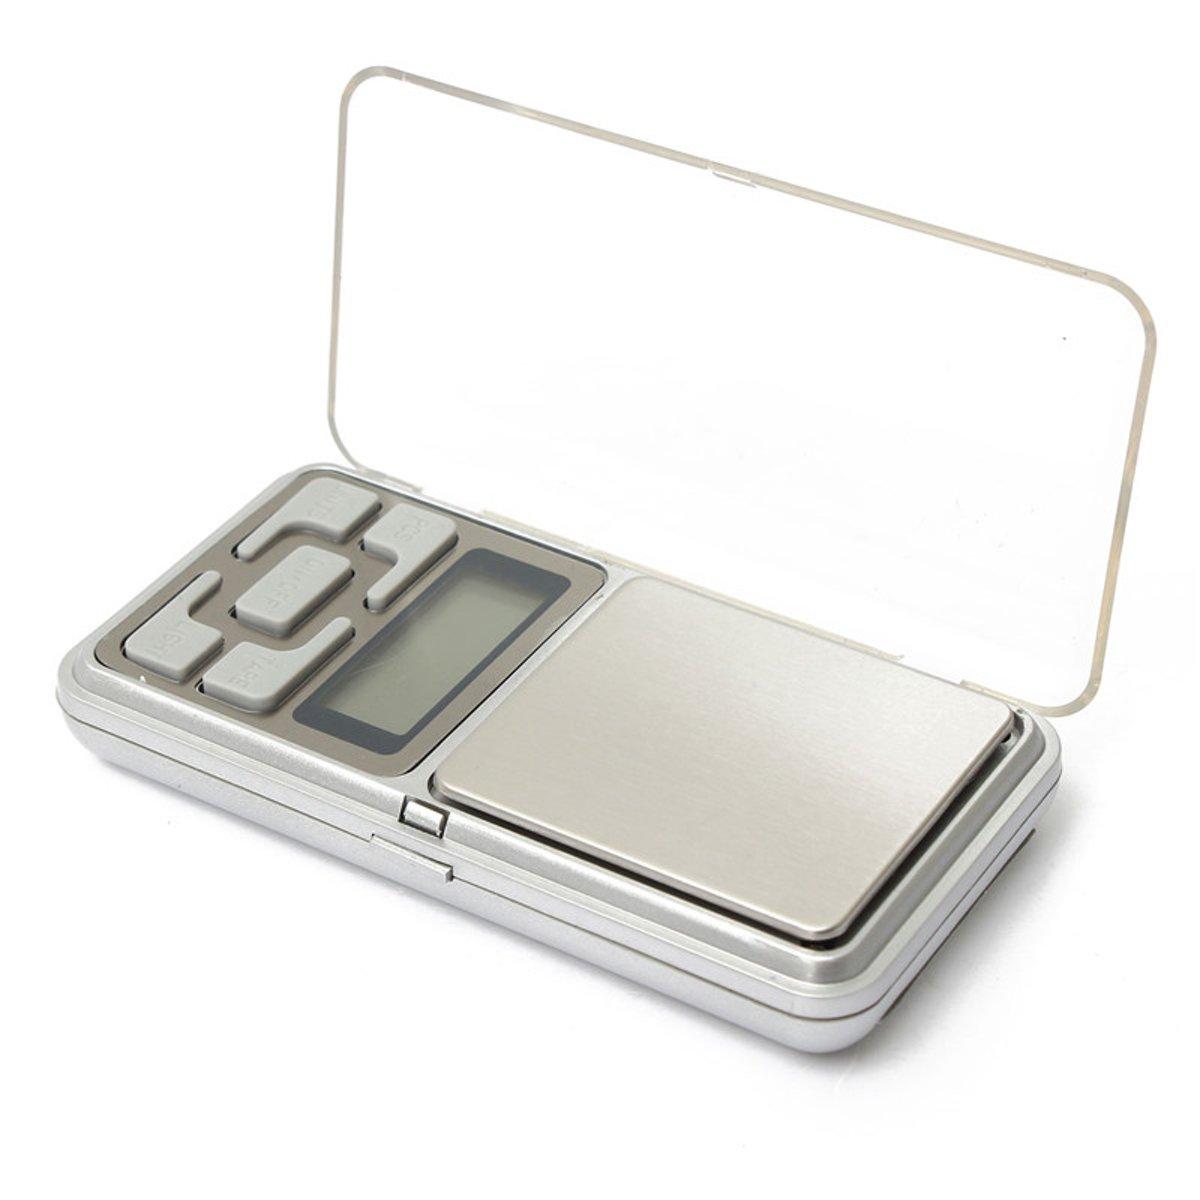 Precisie weegschaal - Pocket weegschaal - Zakweegschaal - Keukenweegschaal - 500gr x 0.1 gr nauwkeurig